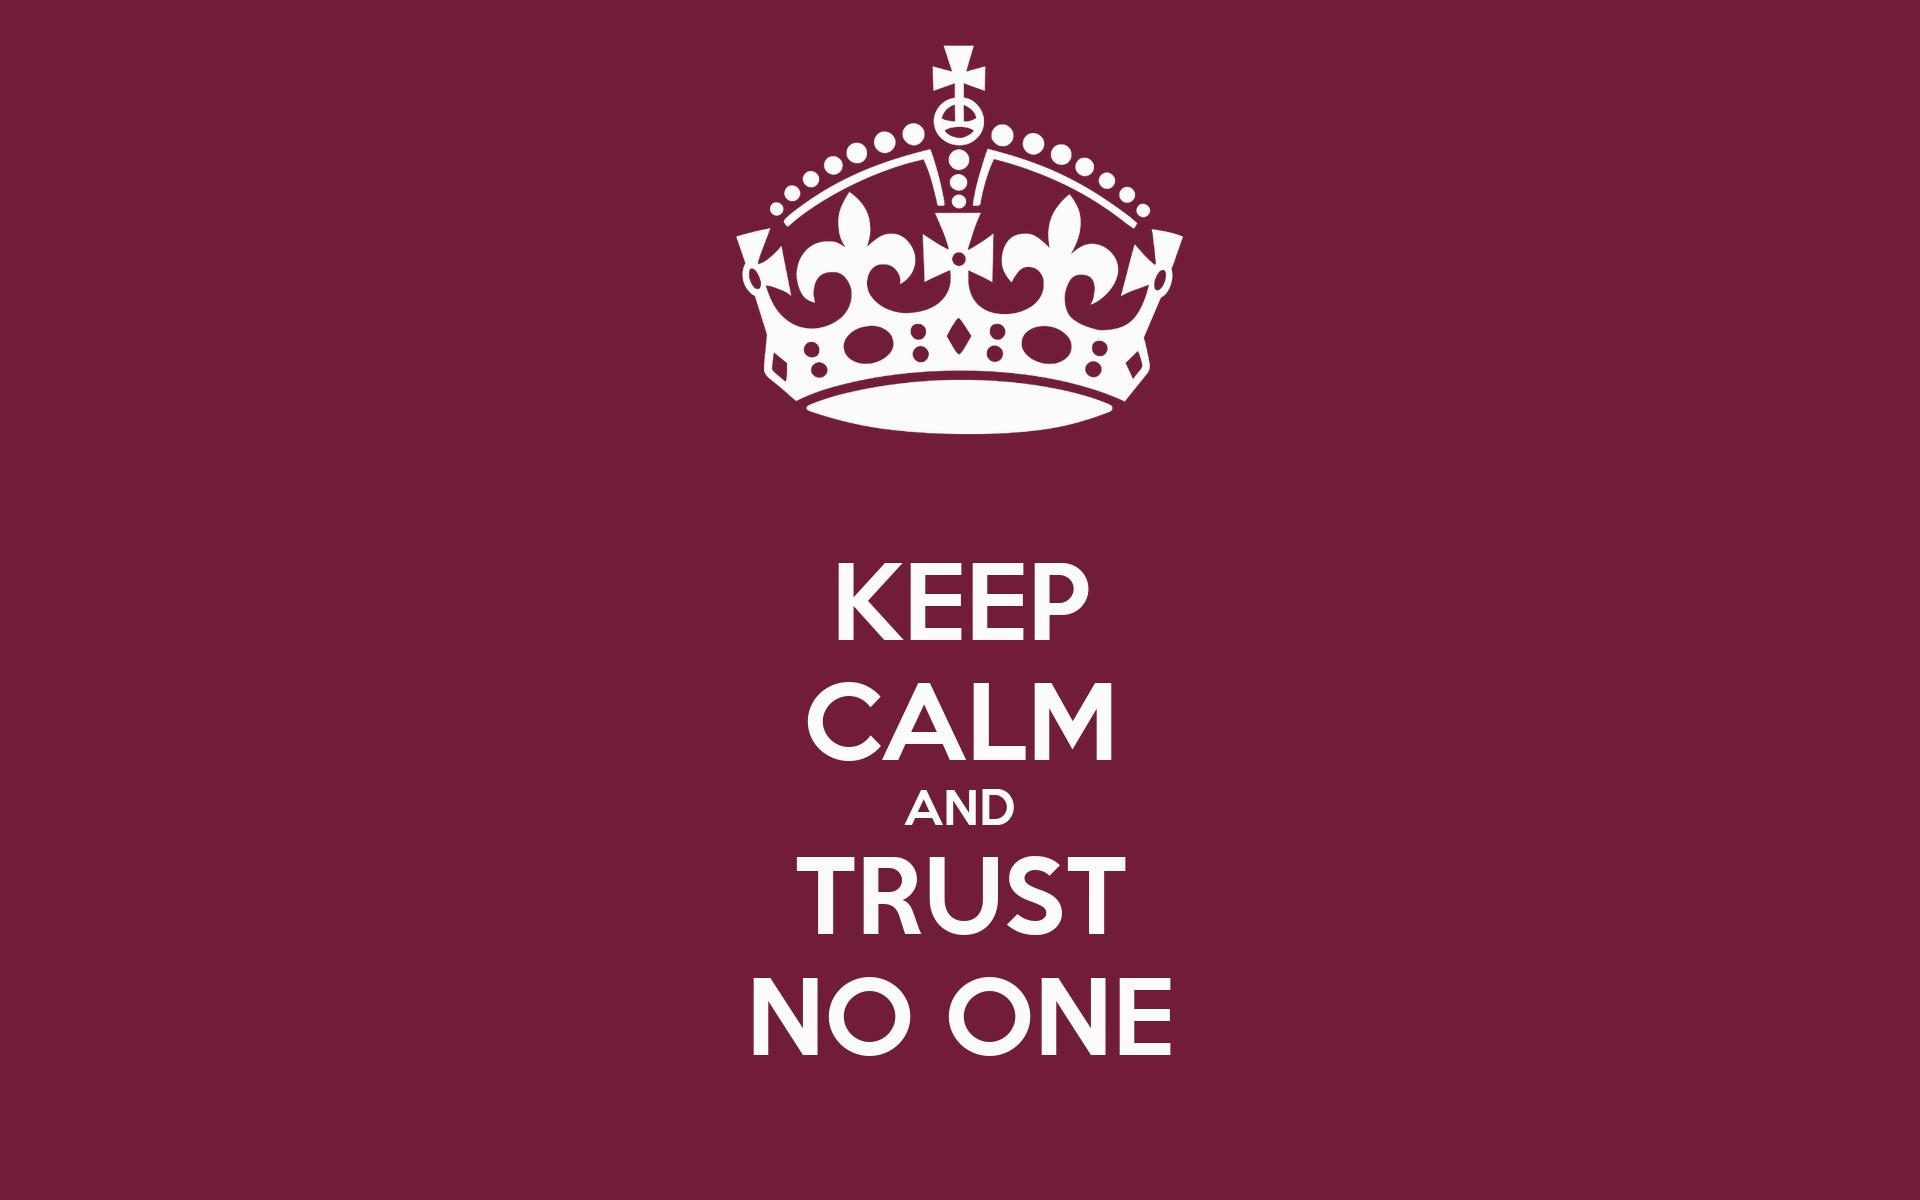 Cute Wallpapers Keep Calm Keep Calm And Trust No One Poster Nej Keep Calm O Matic